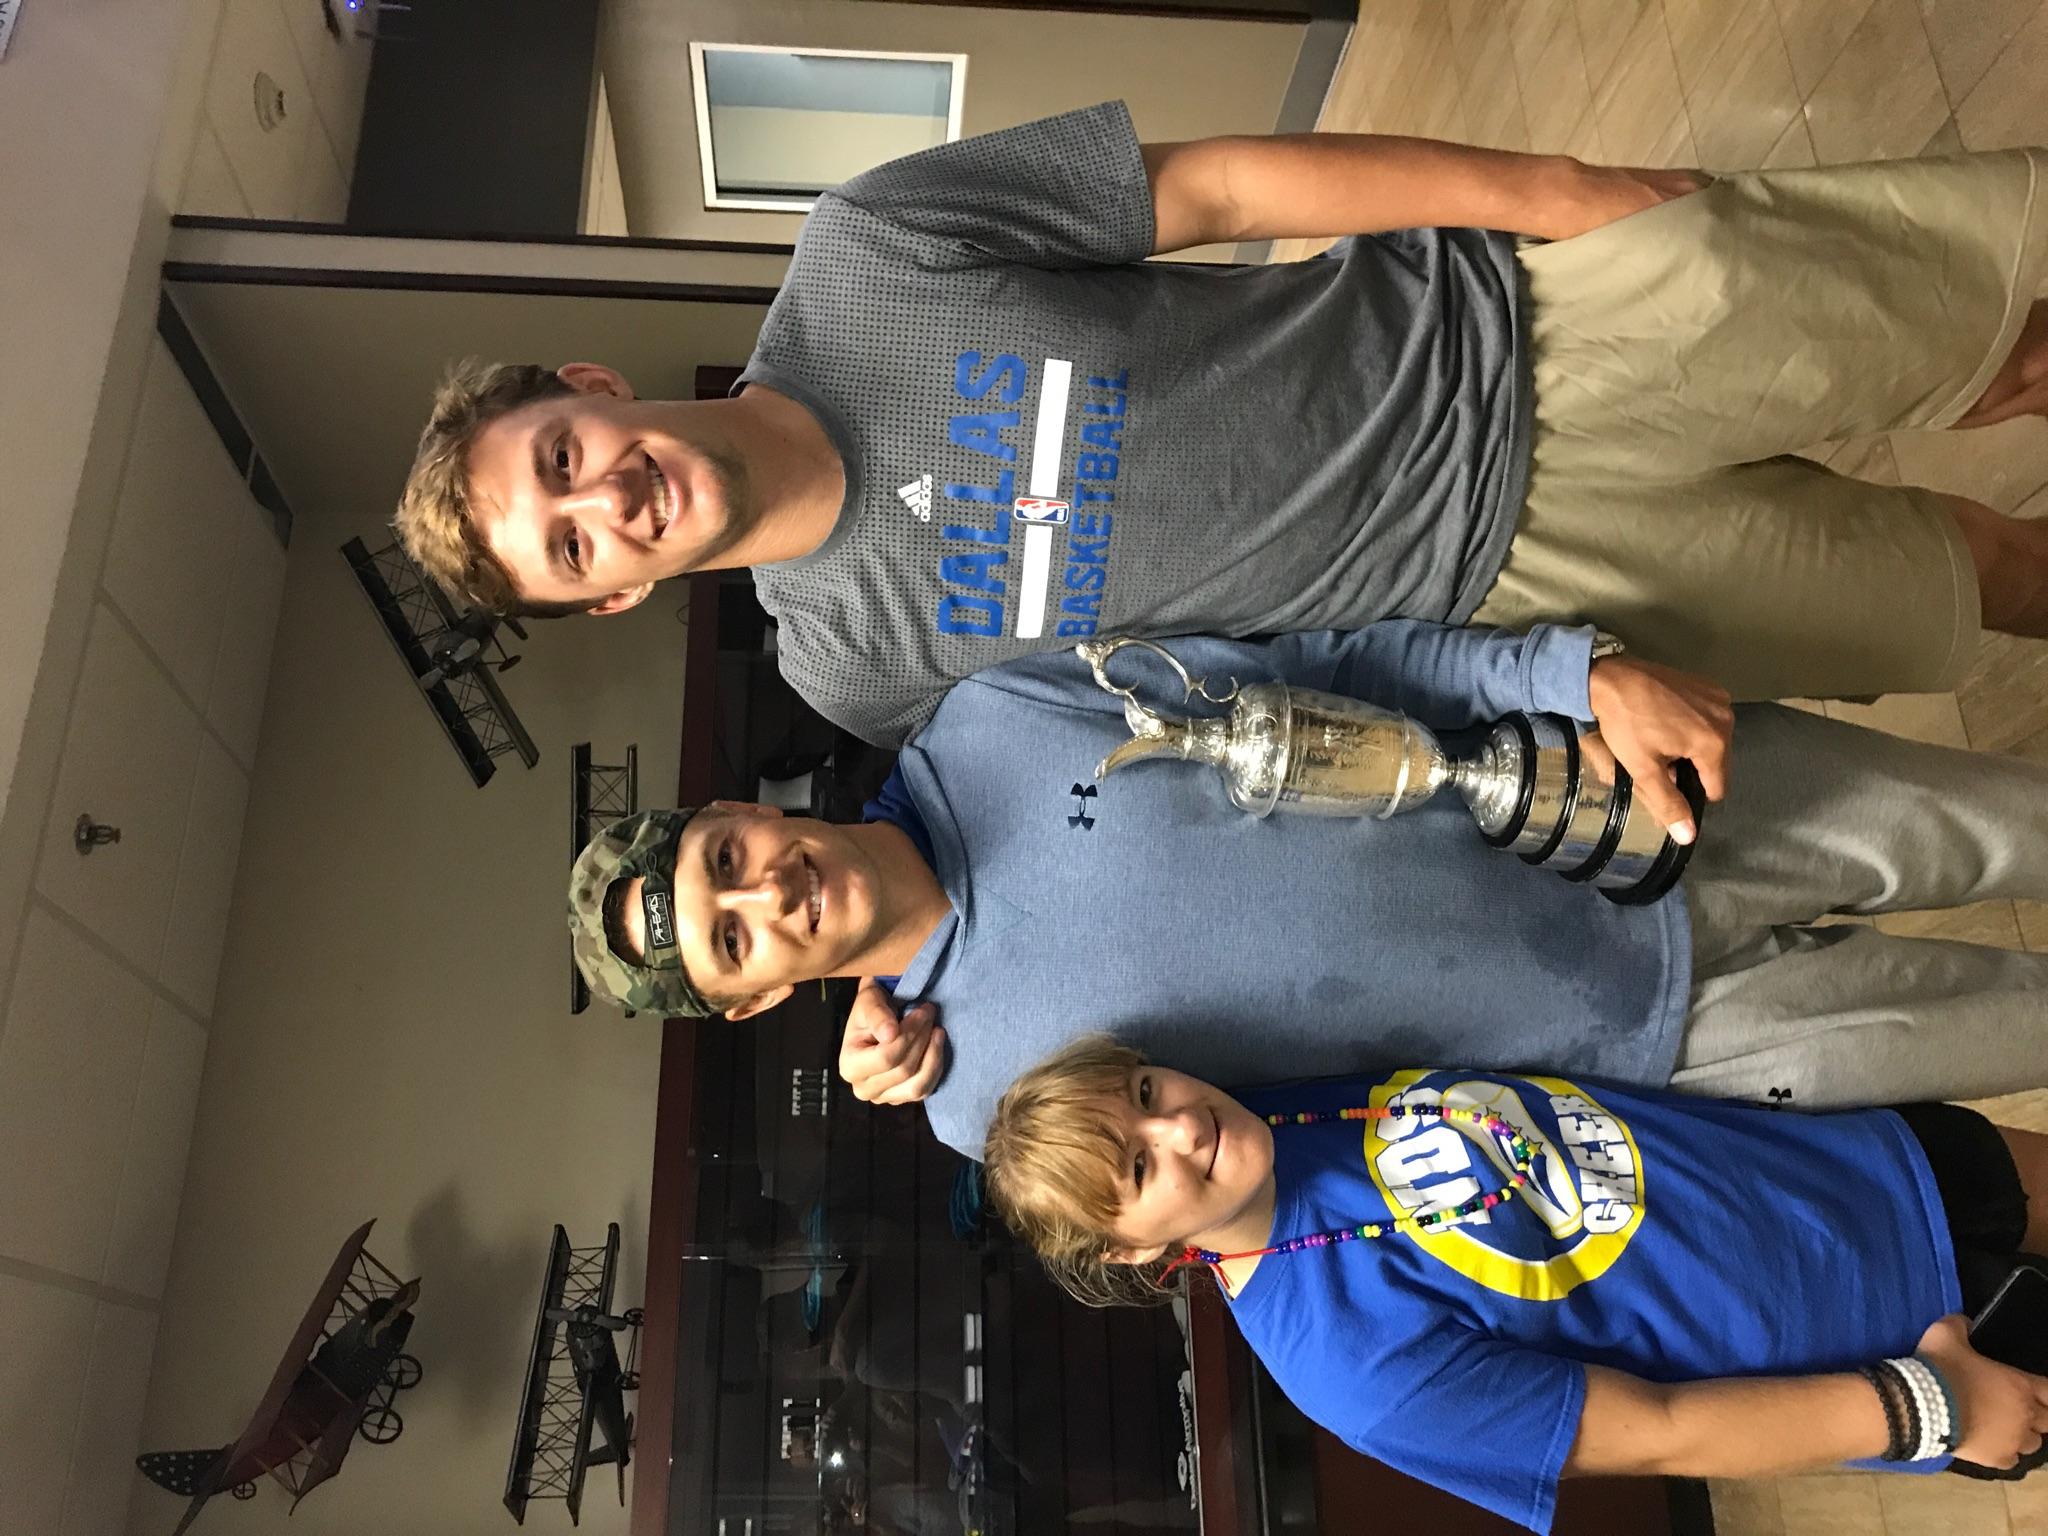 2017 Open Championship: Family Celebration - Jordan and his siblings